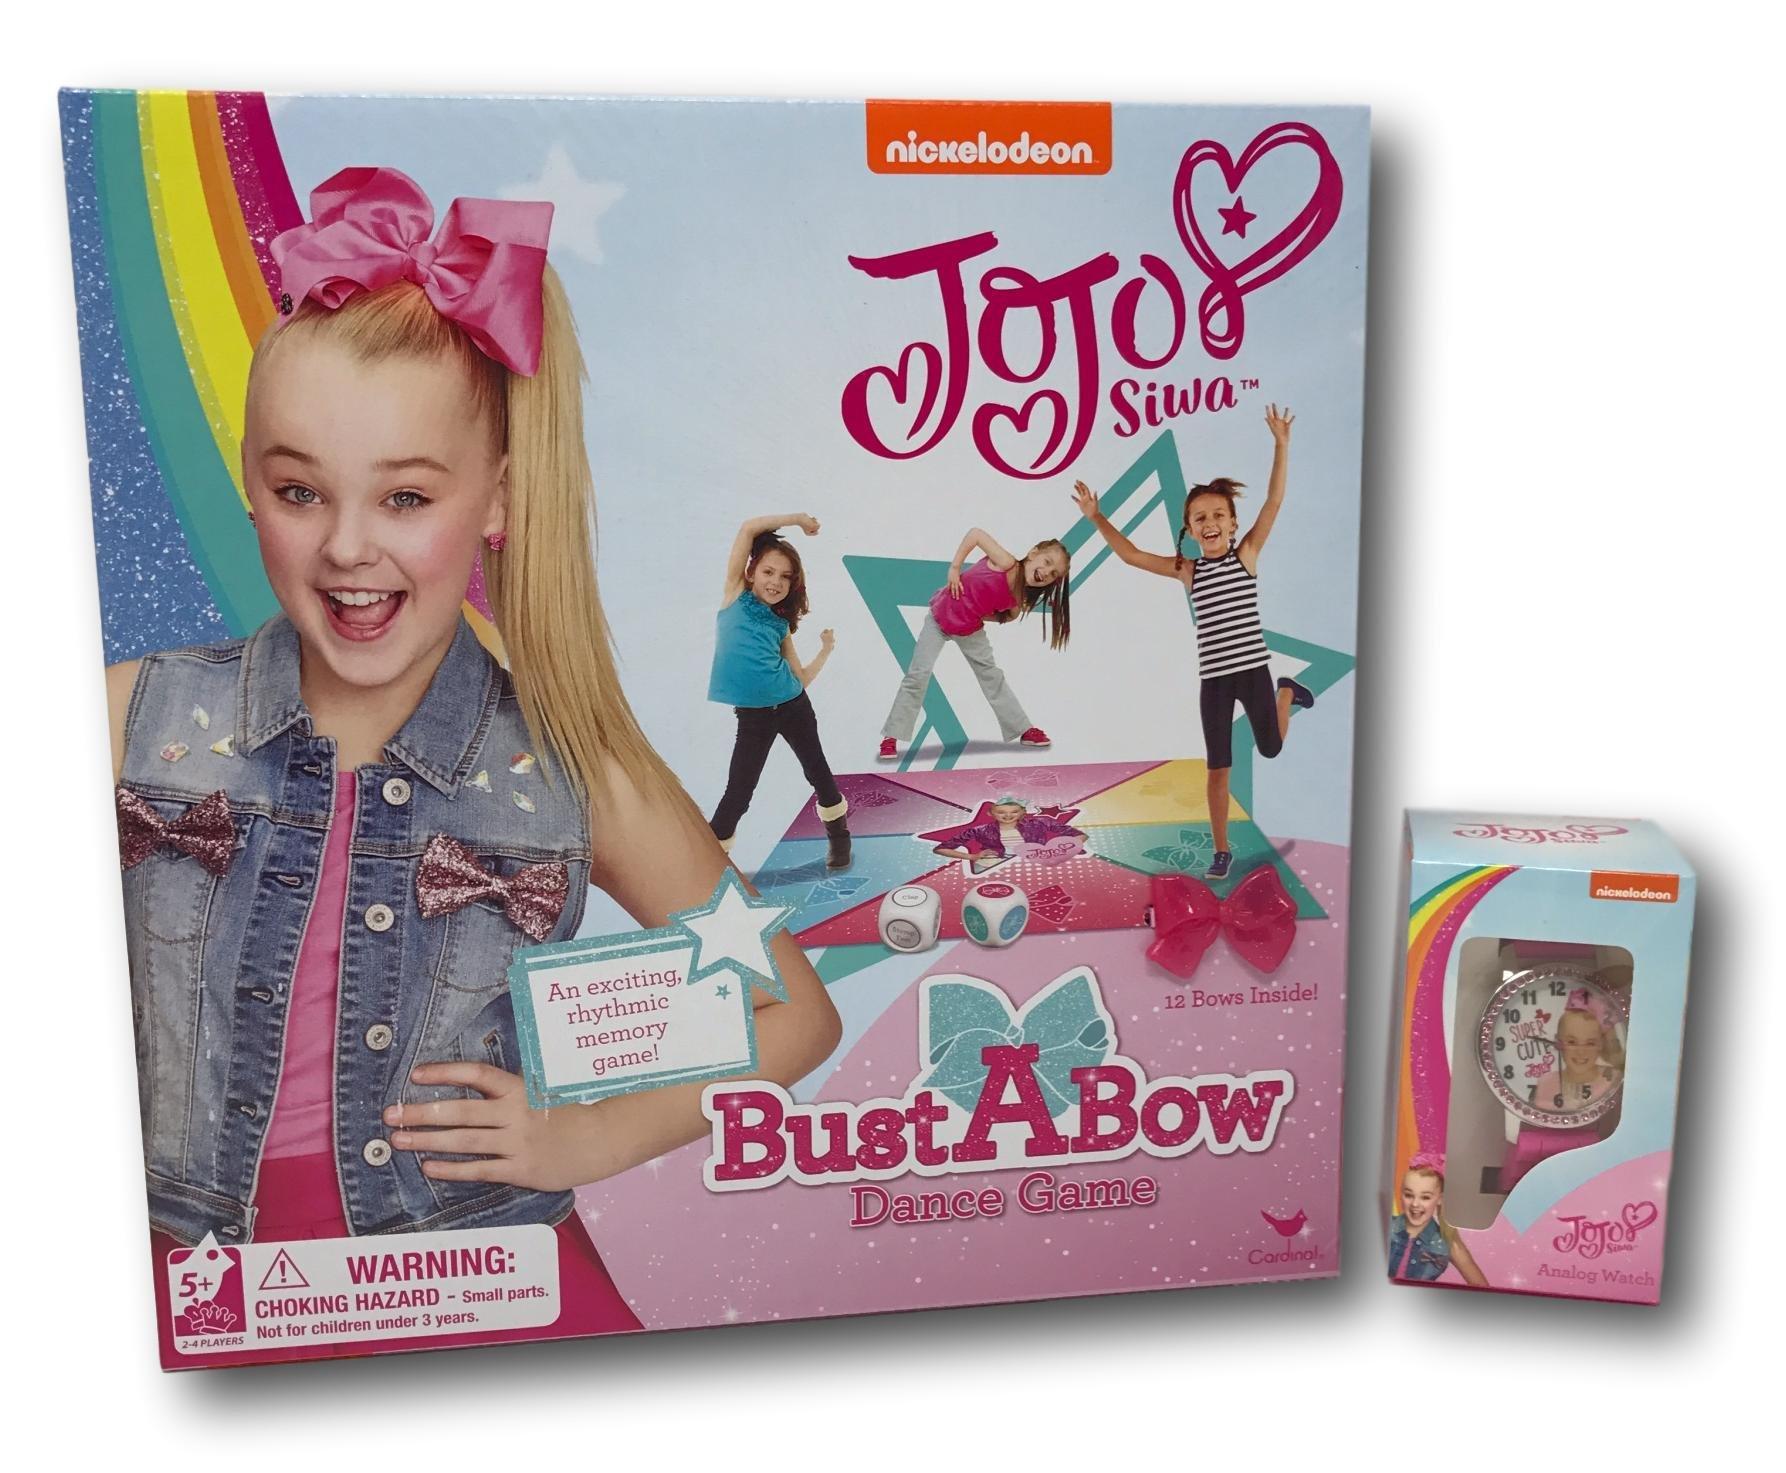 JoJo Siwa BustABow Dance Game and Pink and White Rhinestone Super Cute JoJo Watch Bundle